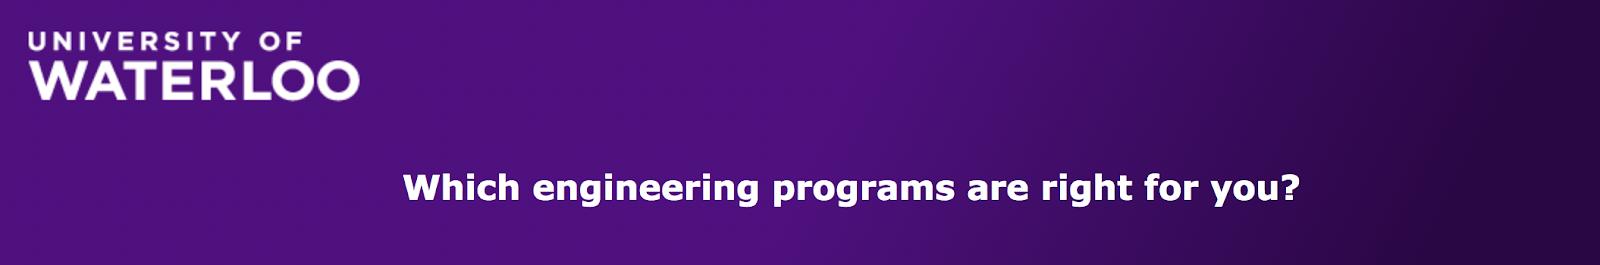 engineering program quiz, the university of waterloo